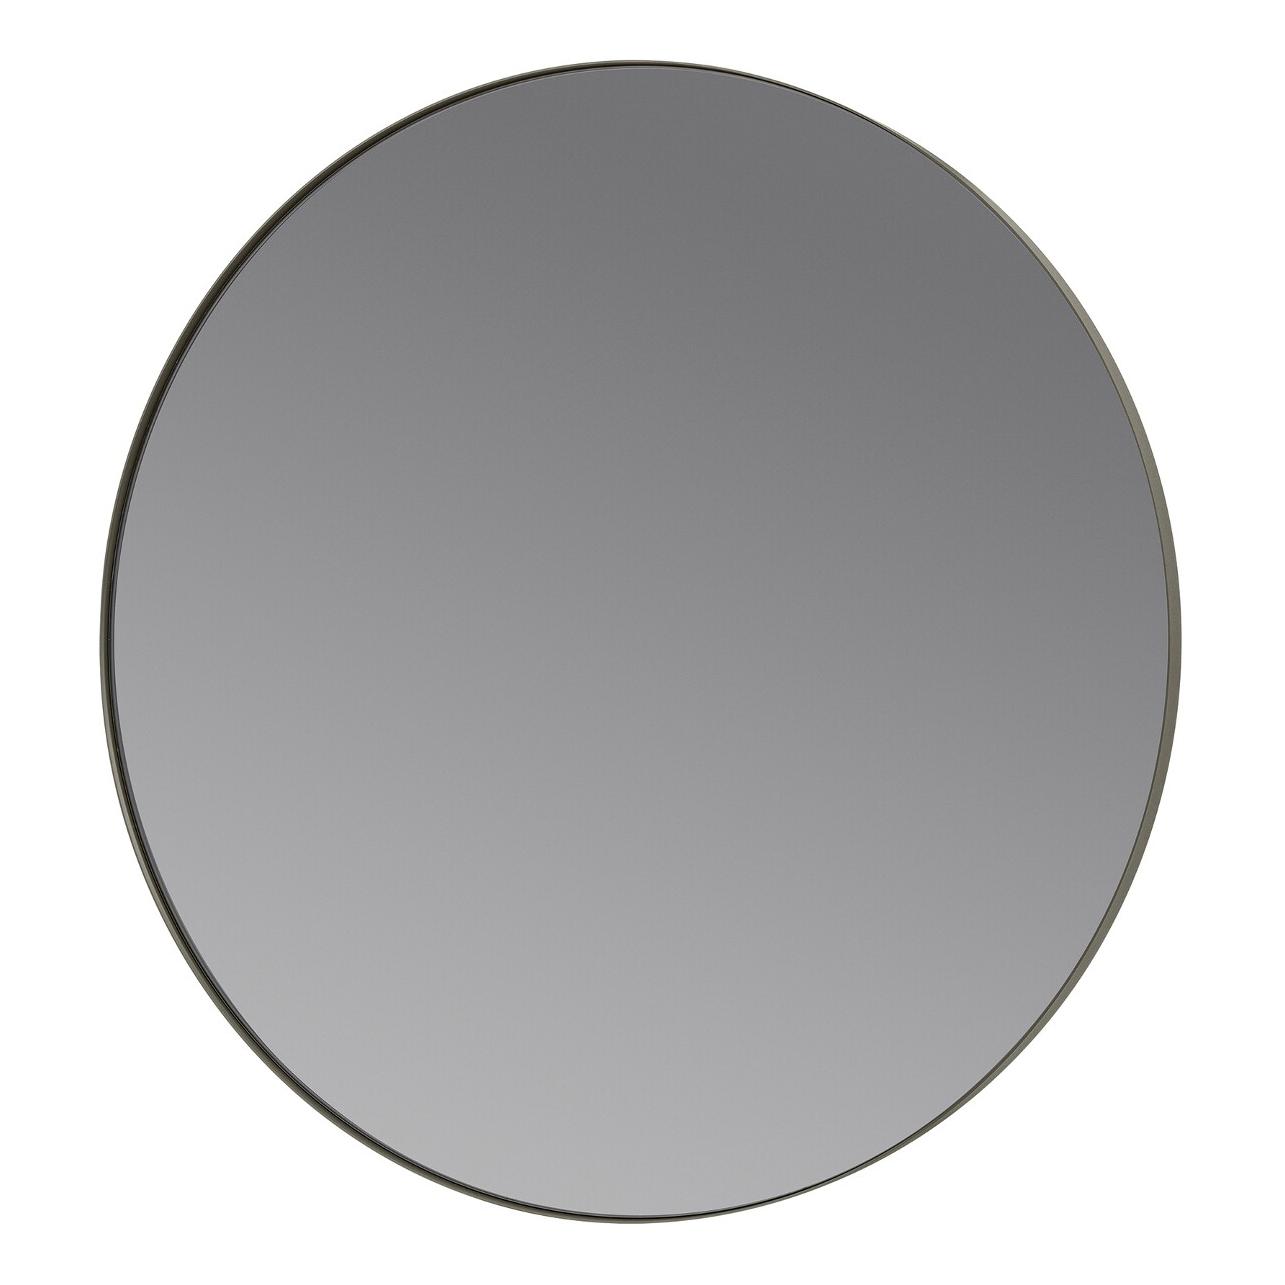 Okrúhle zrkadlo RIM kaki Blomus - Blomus Kulaté RIM 80 cm šedé